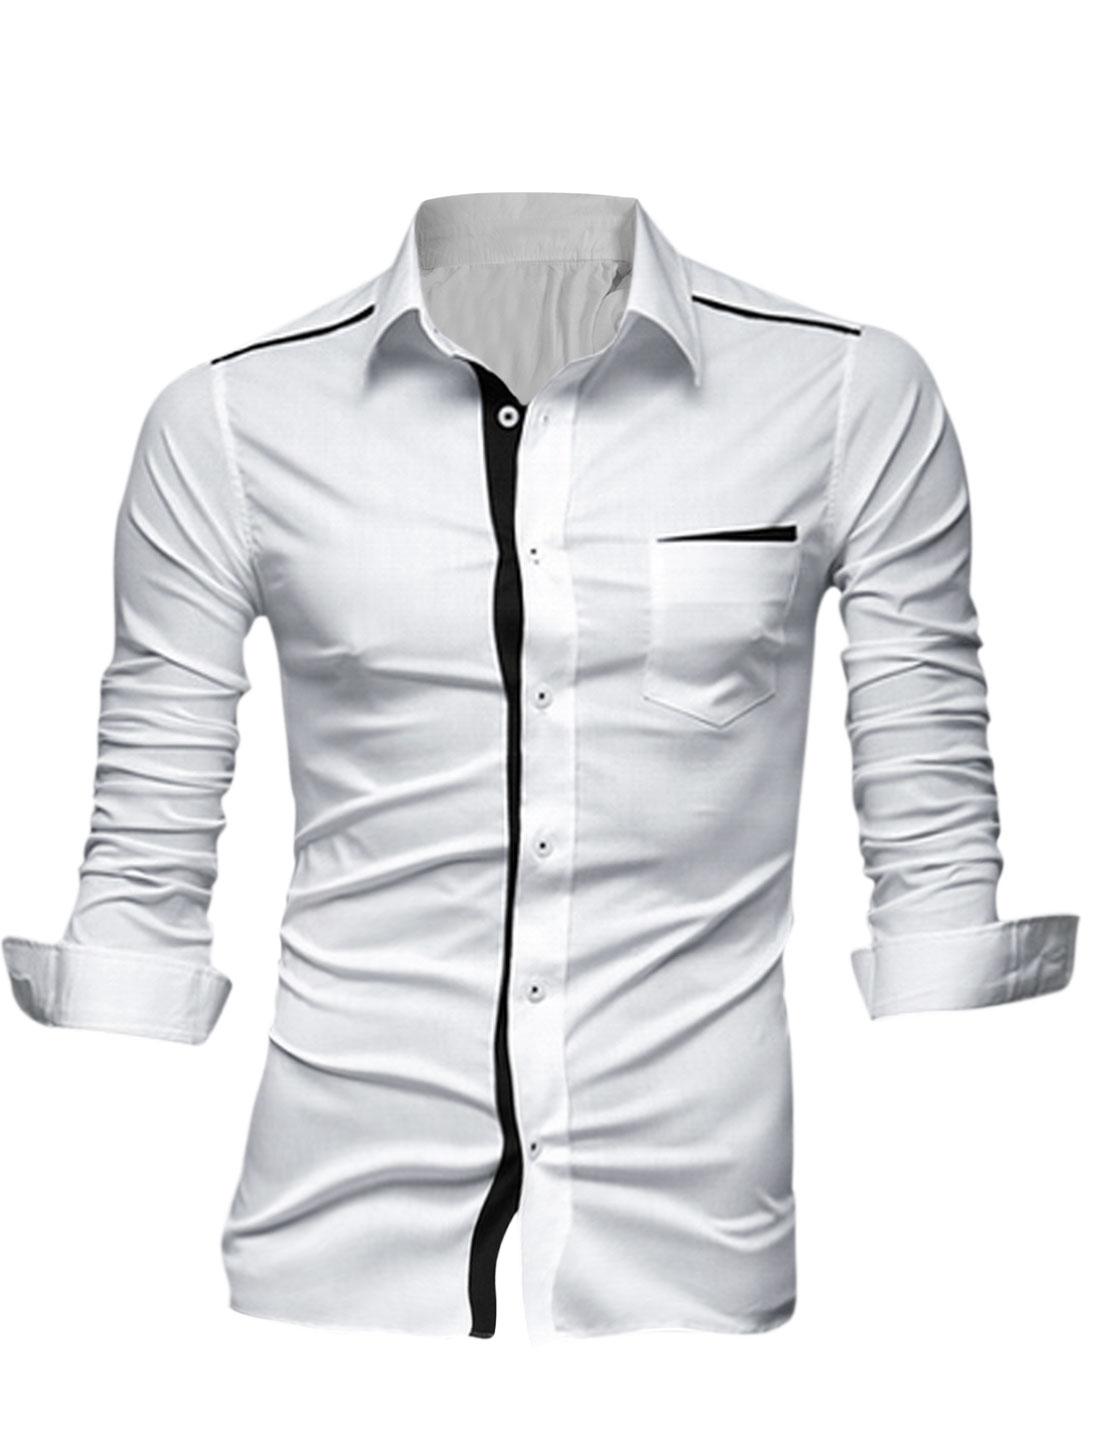 Men Buttoned Cuffs Contrast Color Placket Patched Detail Leisure Shirt White M